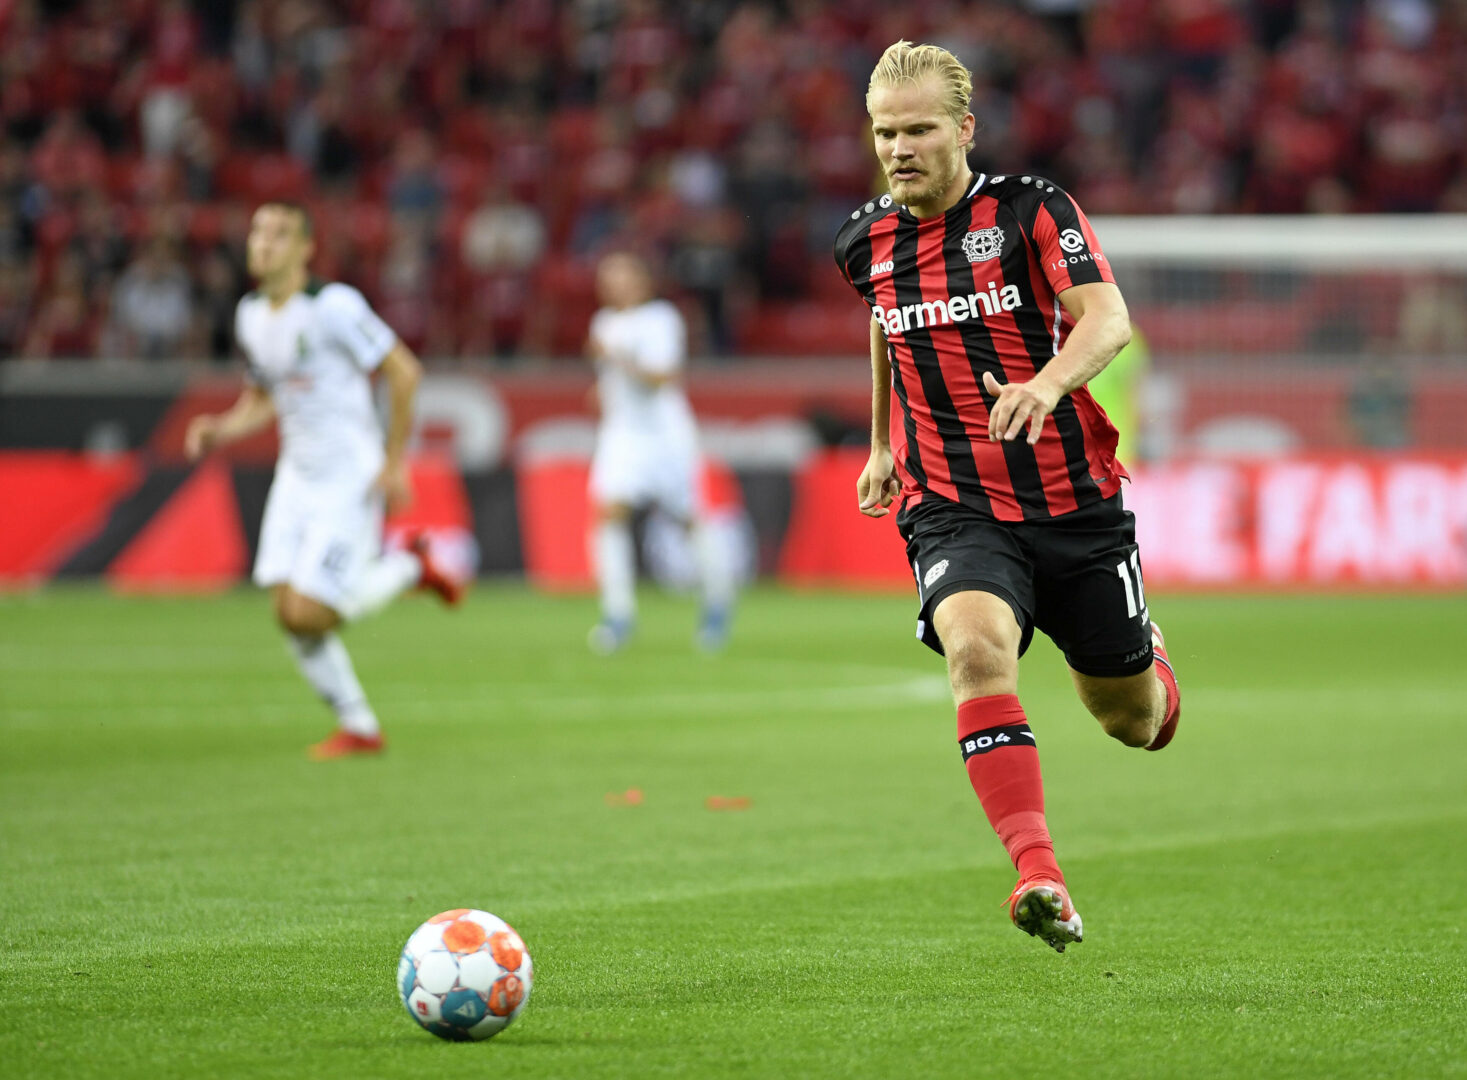 Pohjanpalo (Bayer Leverkusen) läuft dem Ball hinterher